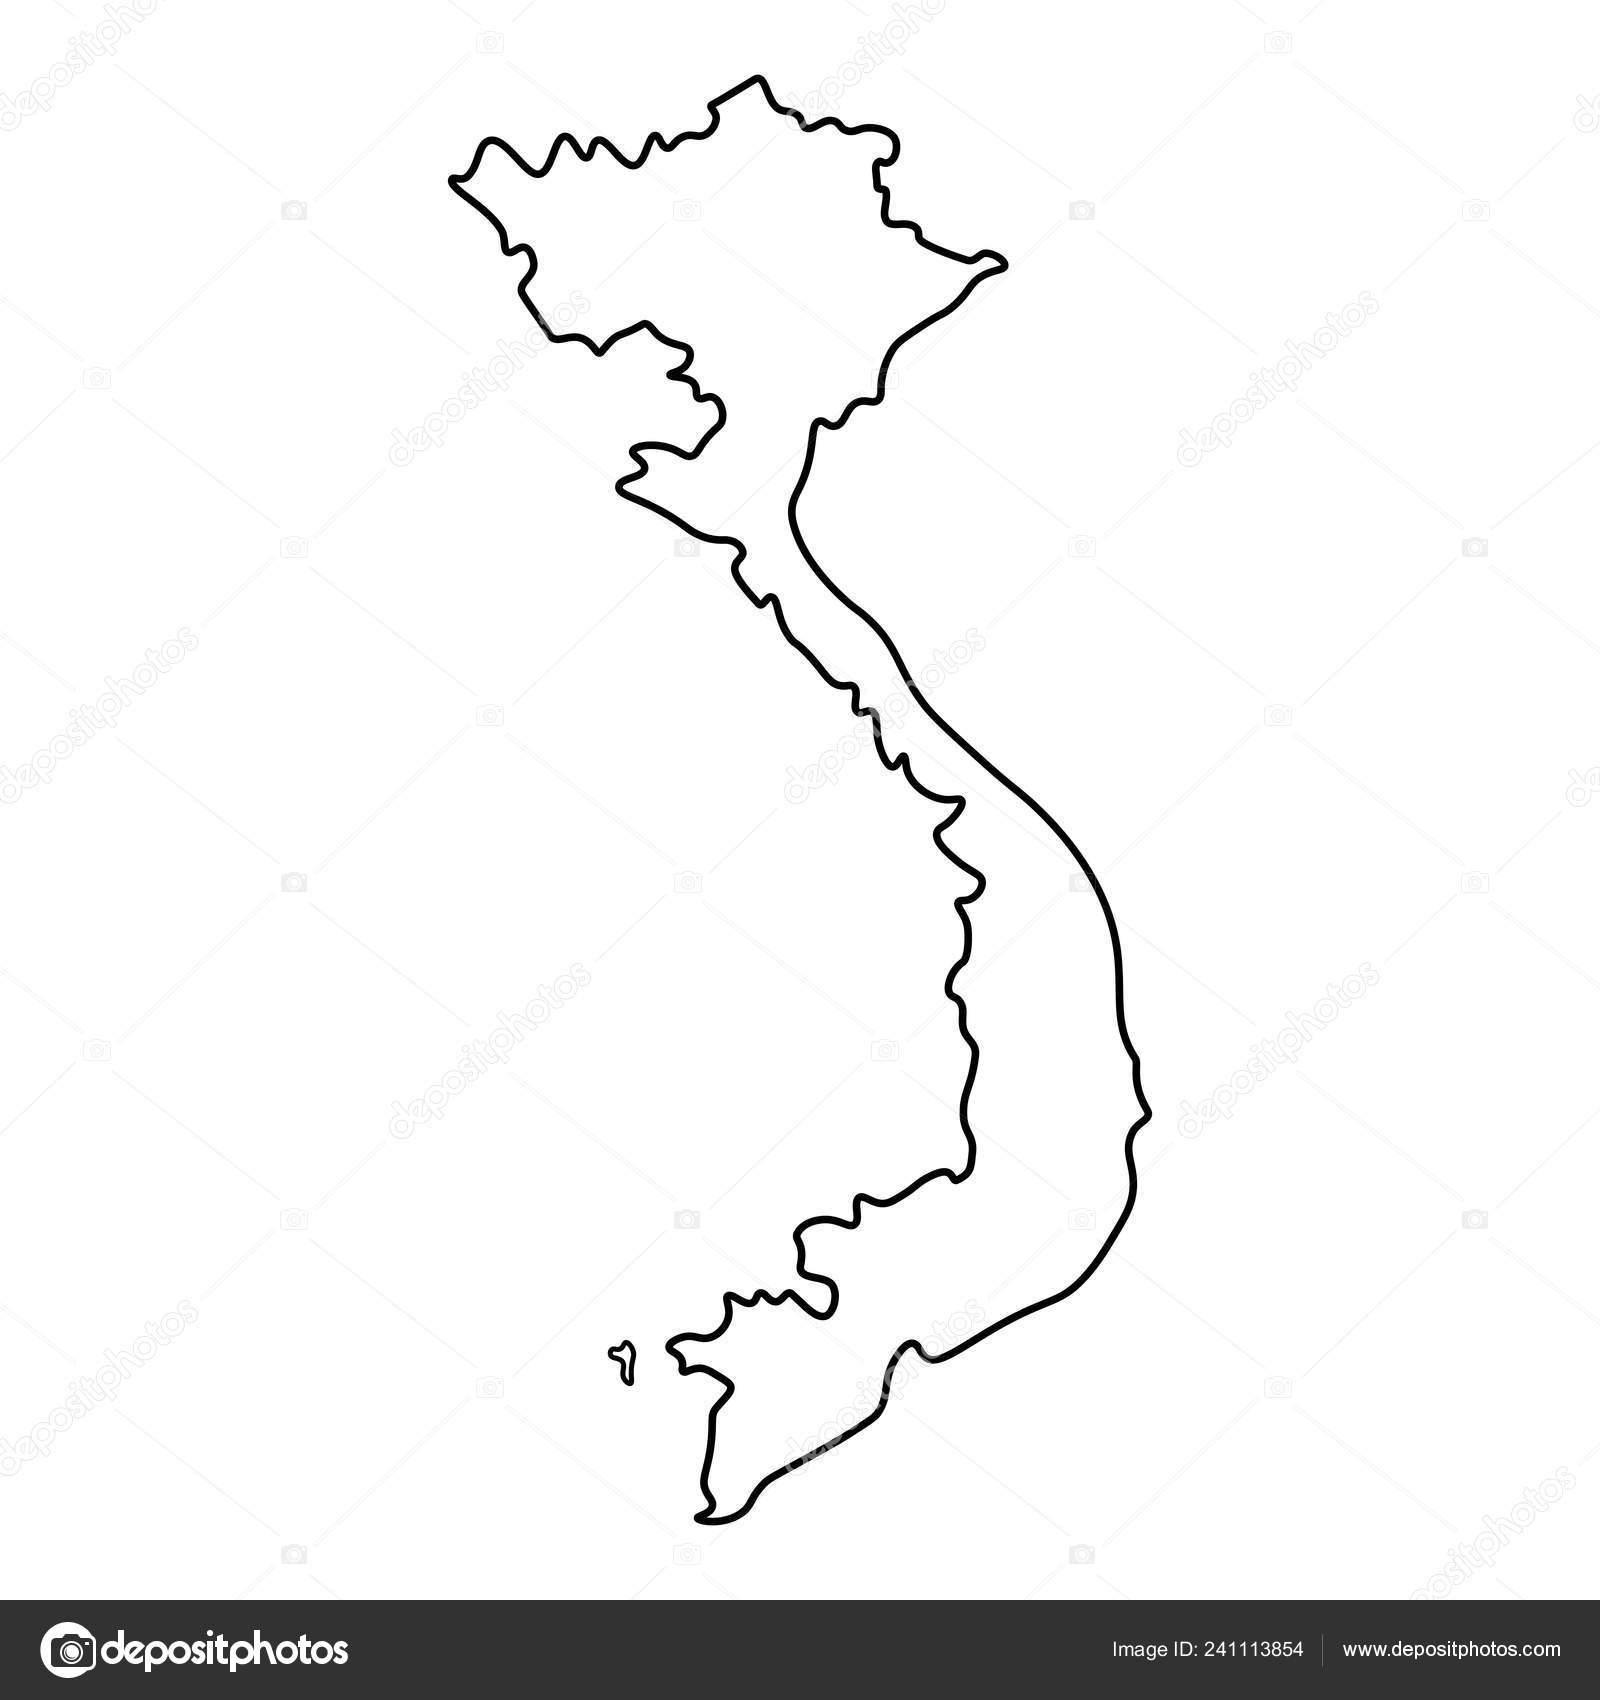 Picture of: Map Vietnam Outline Silhouette Vietnam Map Vector Illustration Stock Vector C Ollegn 241113854